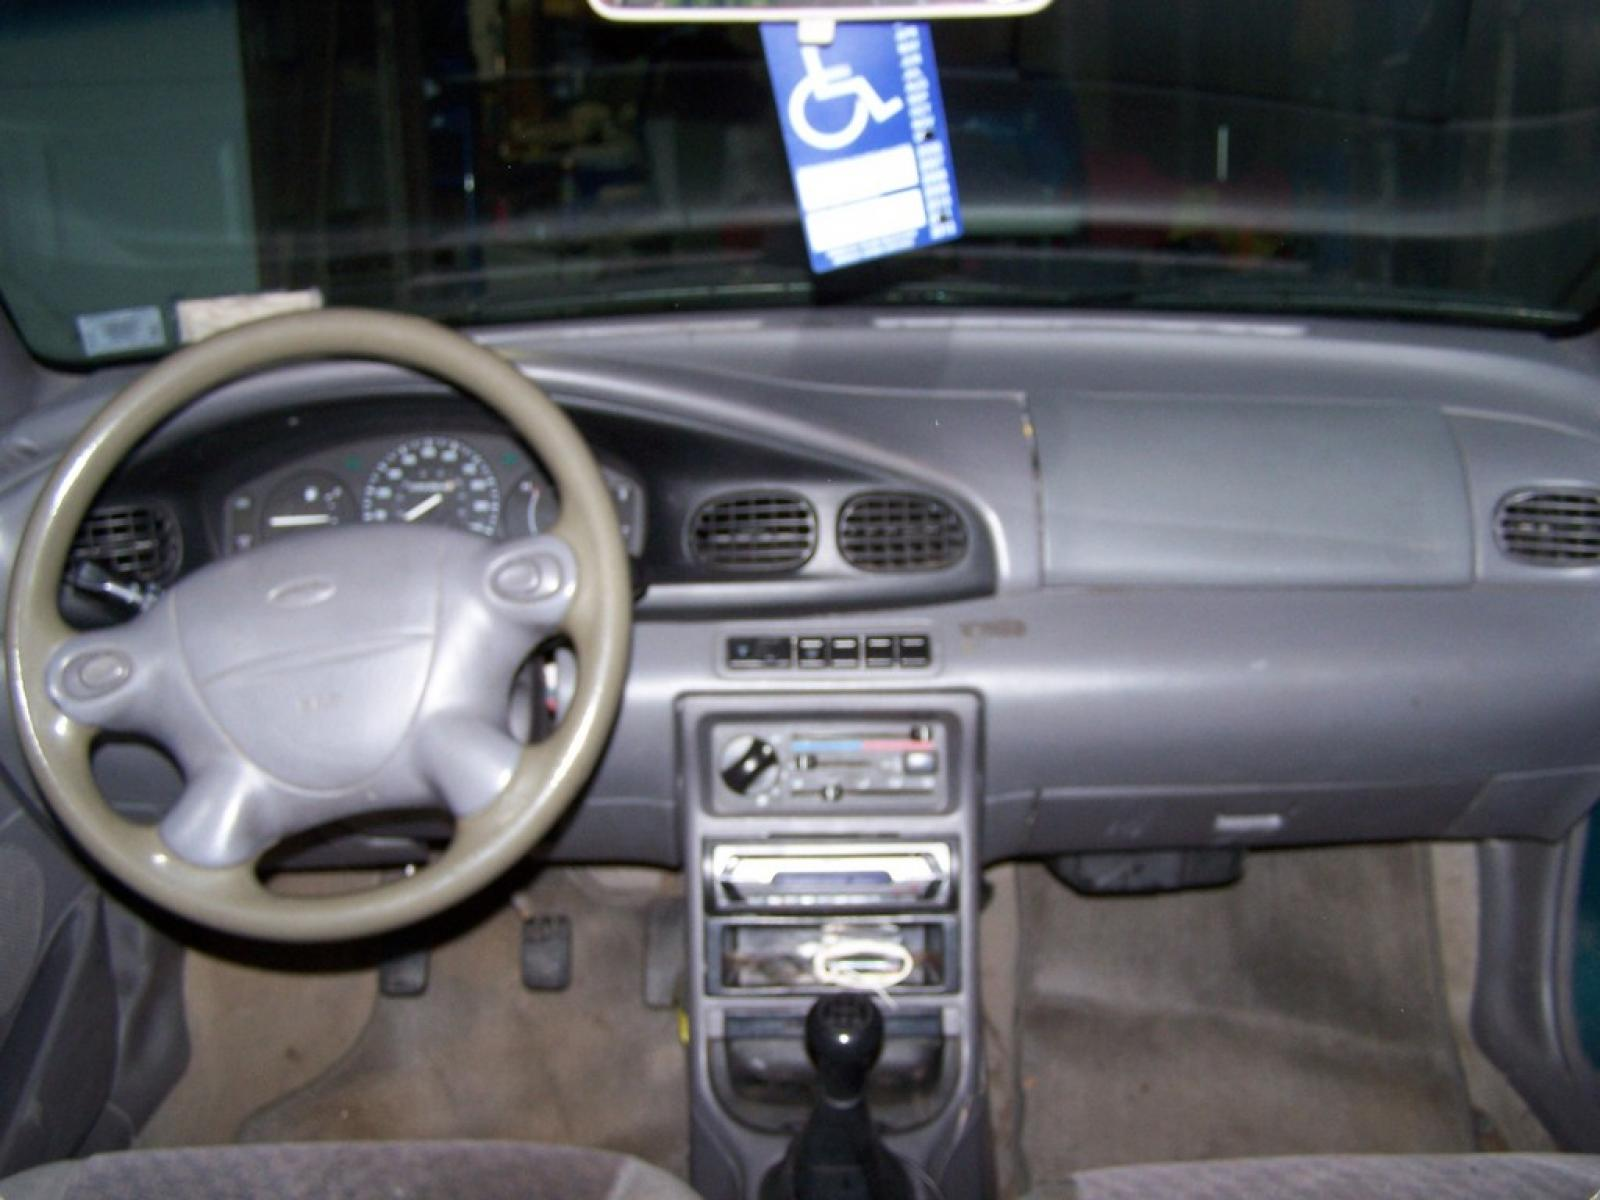 800 1024 1280 1600 origin 1997 ford aspire